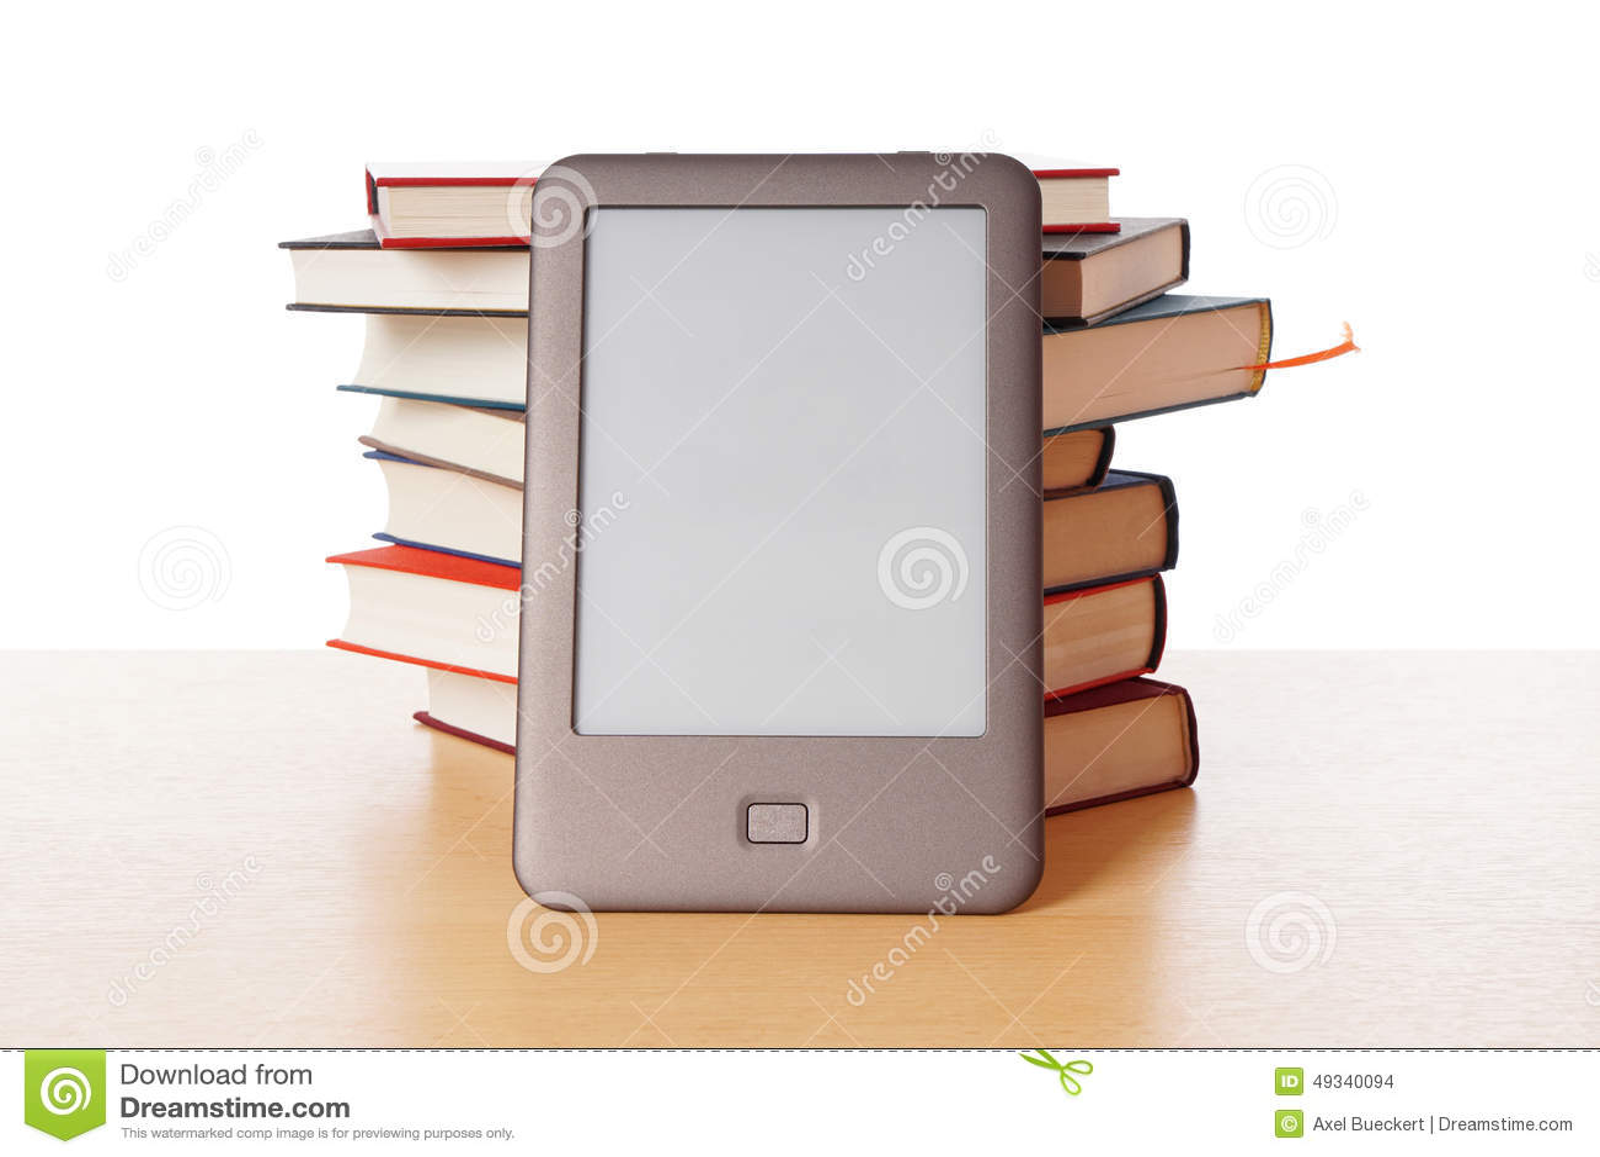 Ebook reader vs pile of books